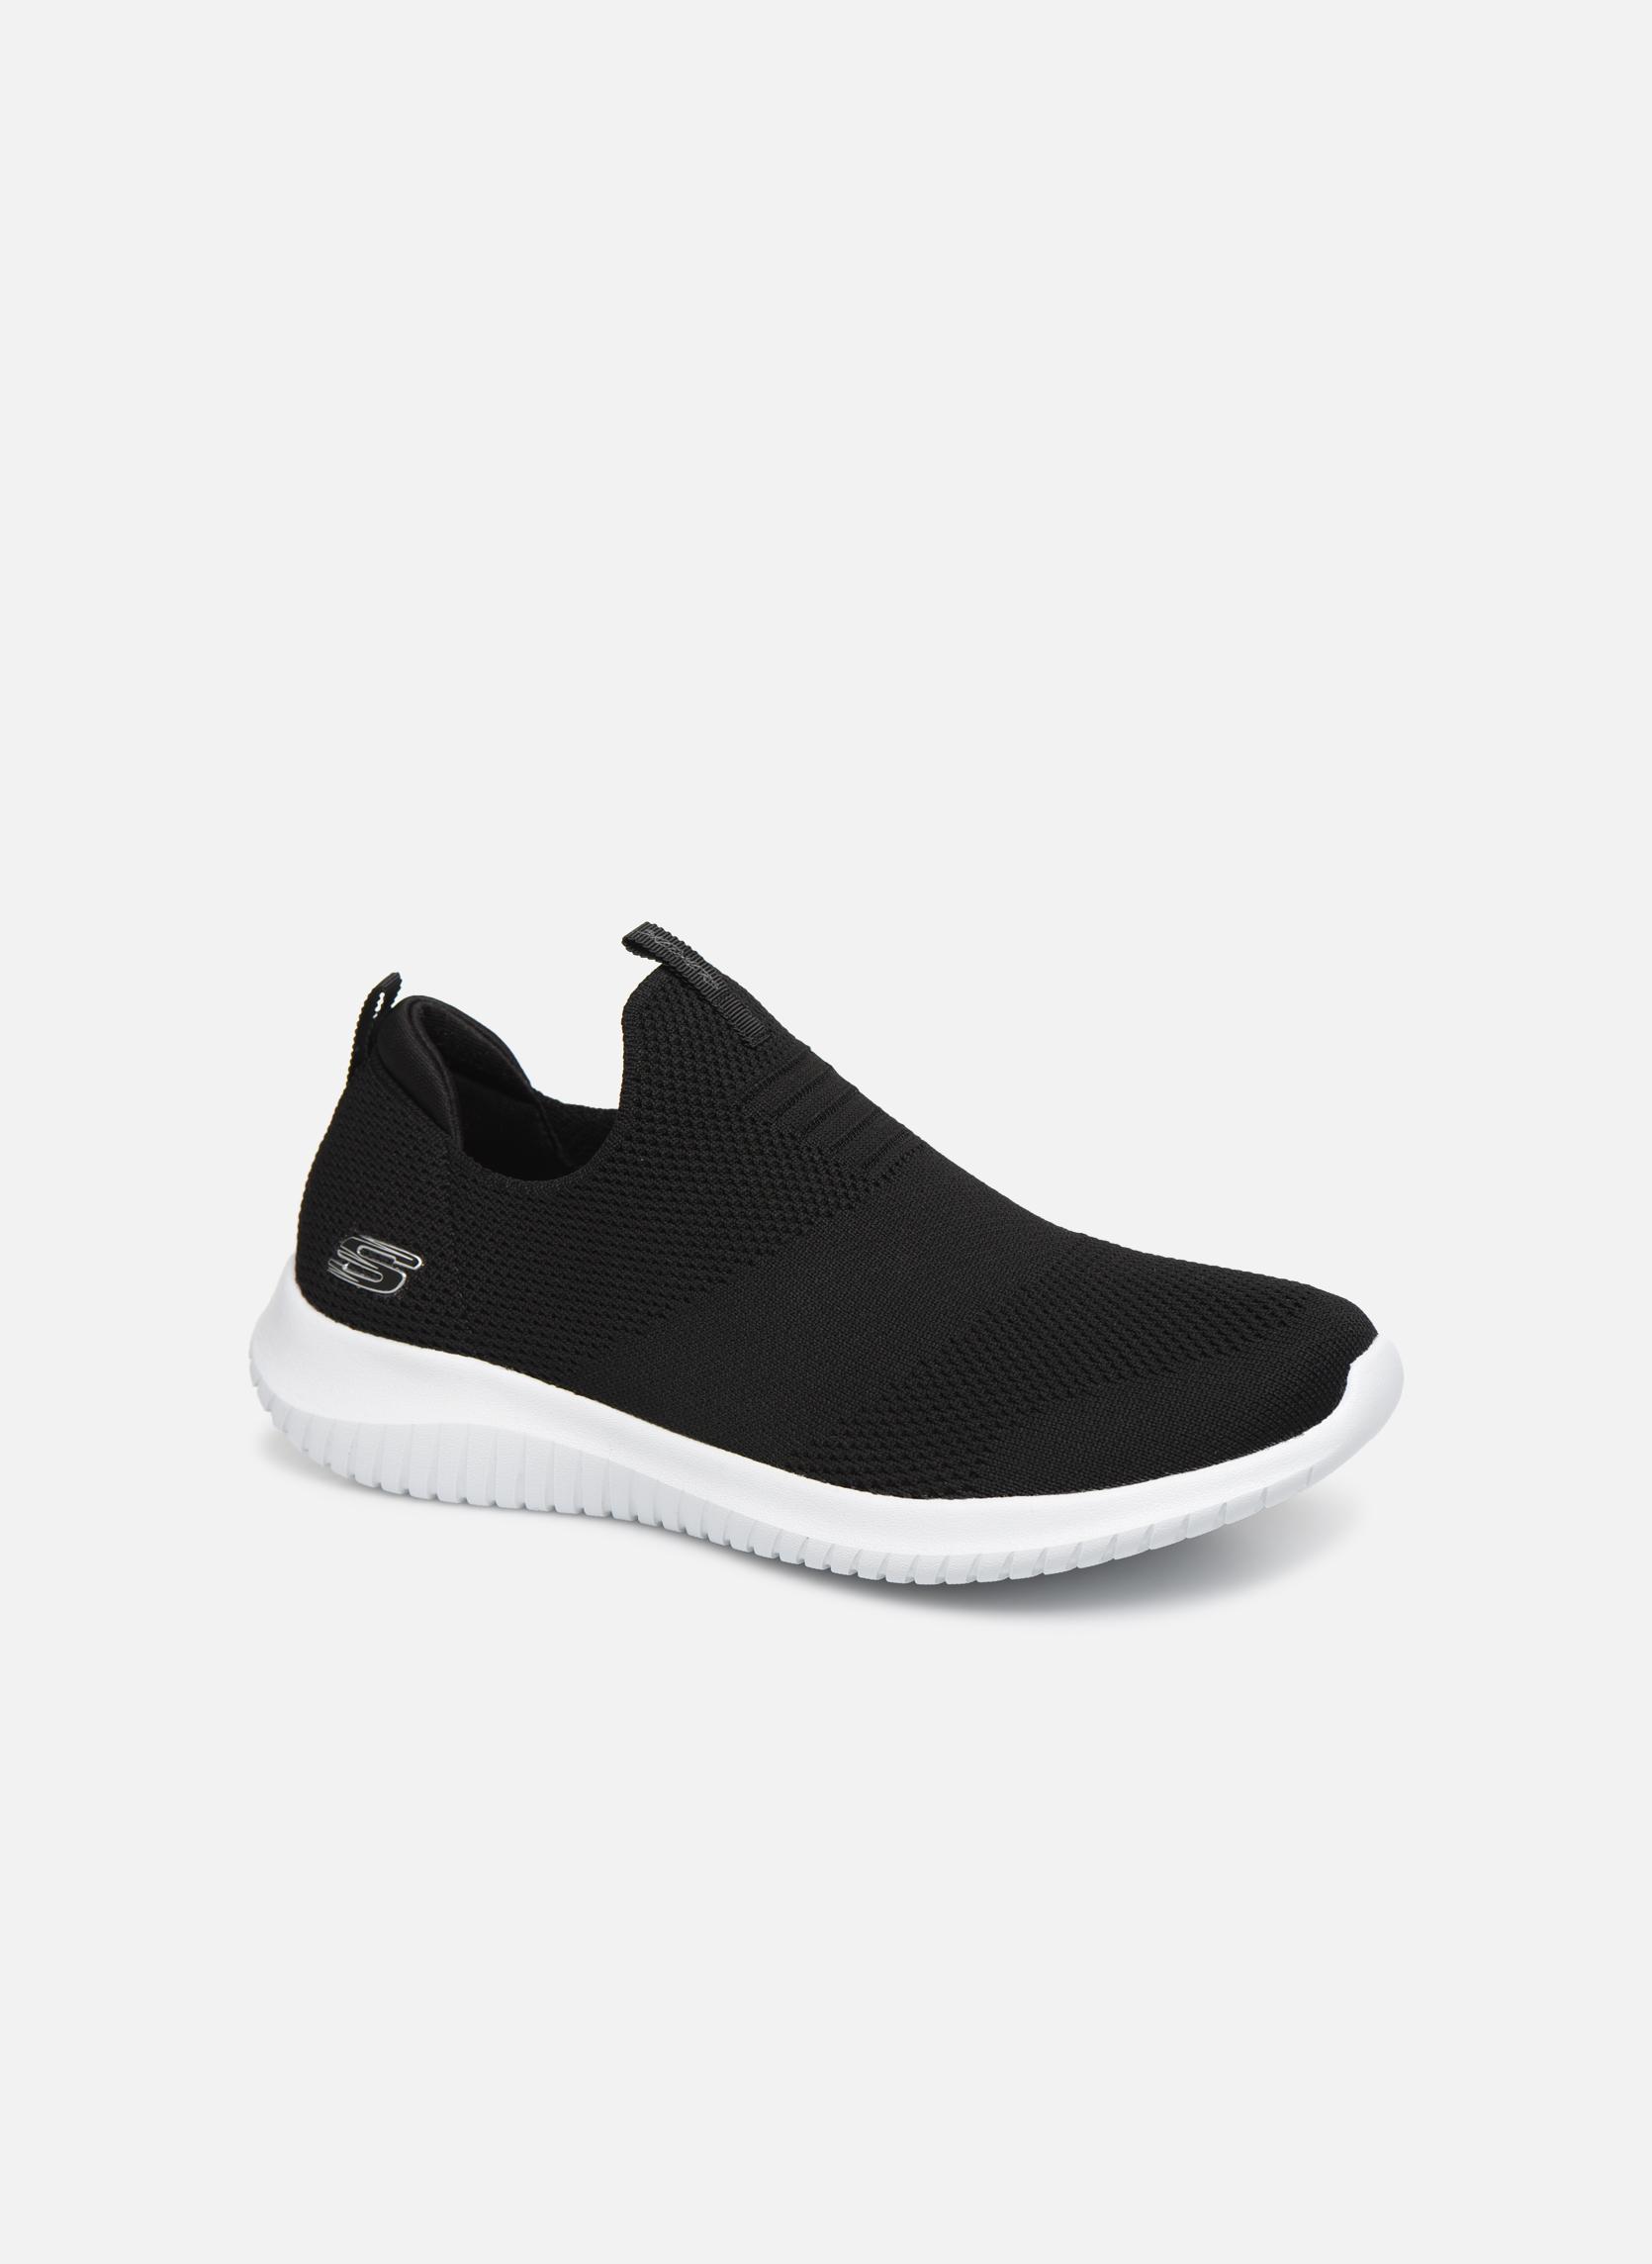 Chaussures de sport Skechers Ultra Flex First Take Noir vue détail/paire